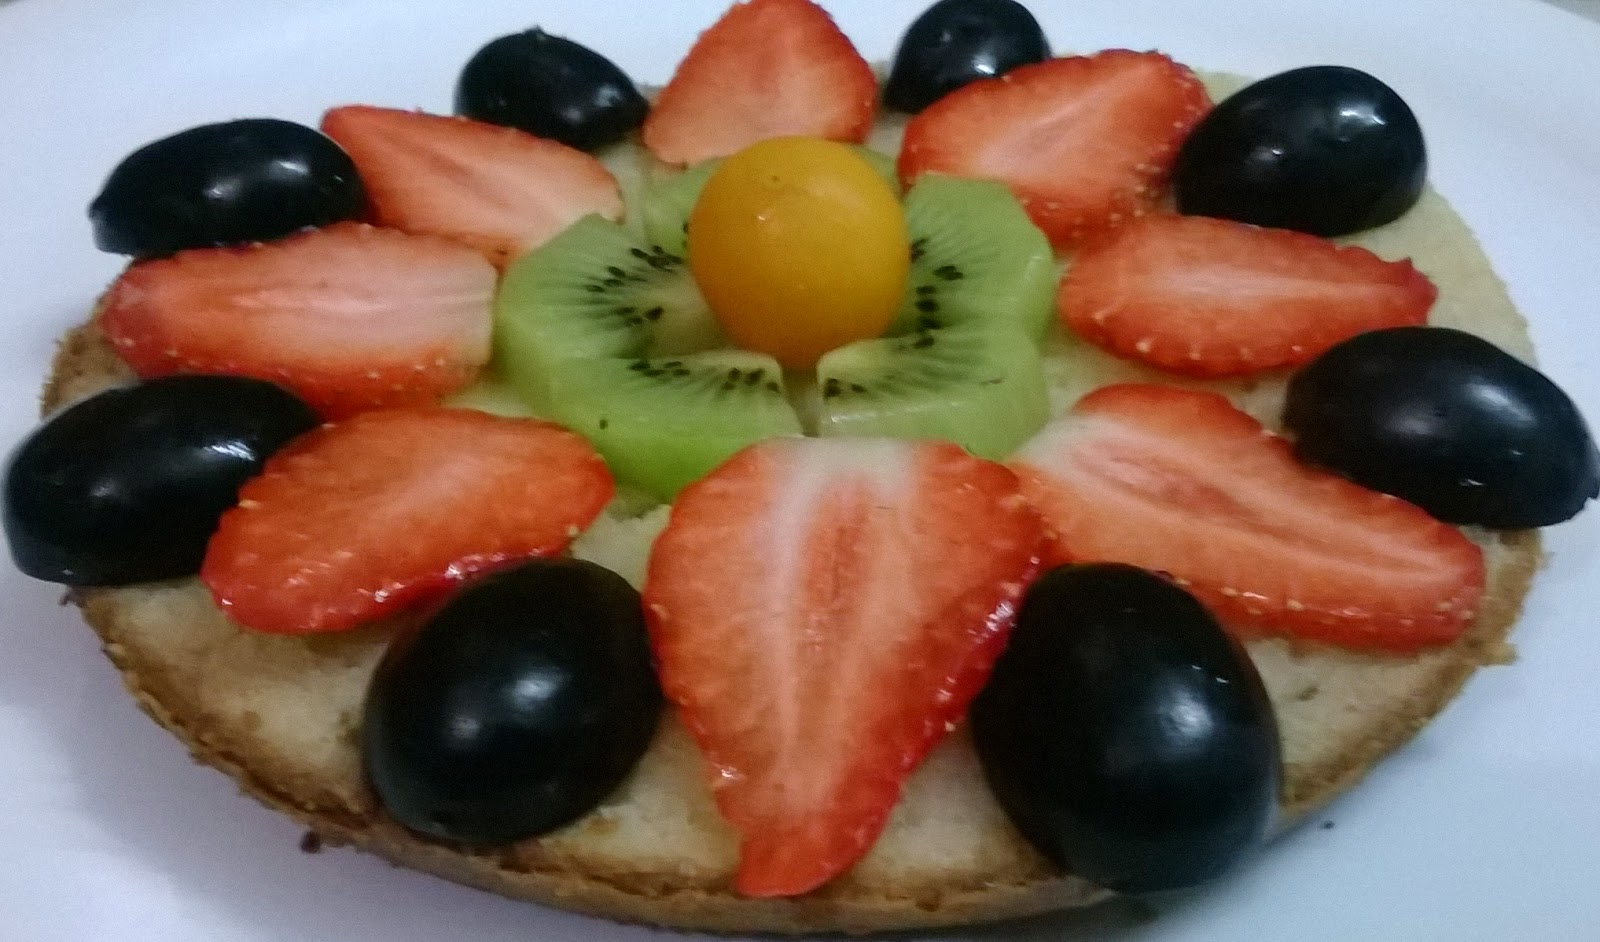 http://www.paakvidhi.com/2013/07/sponge-cake.html